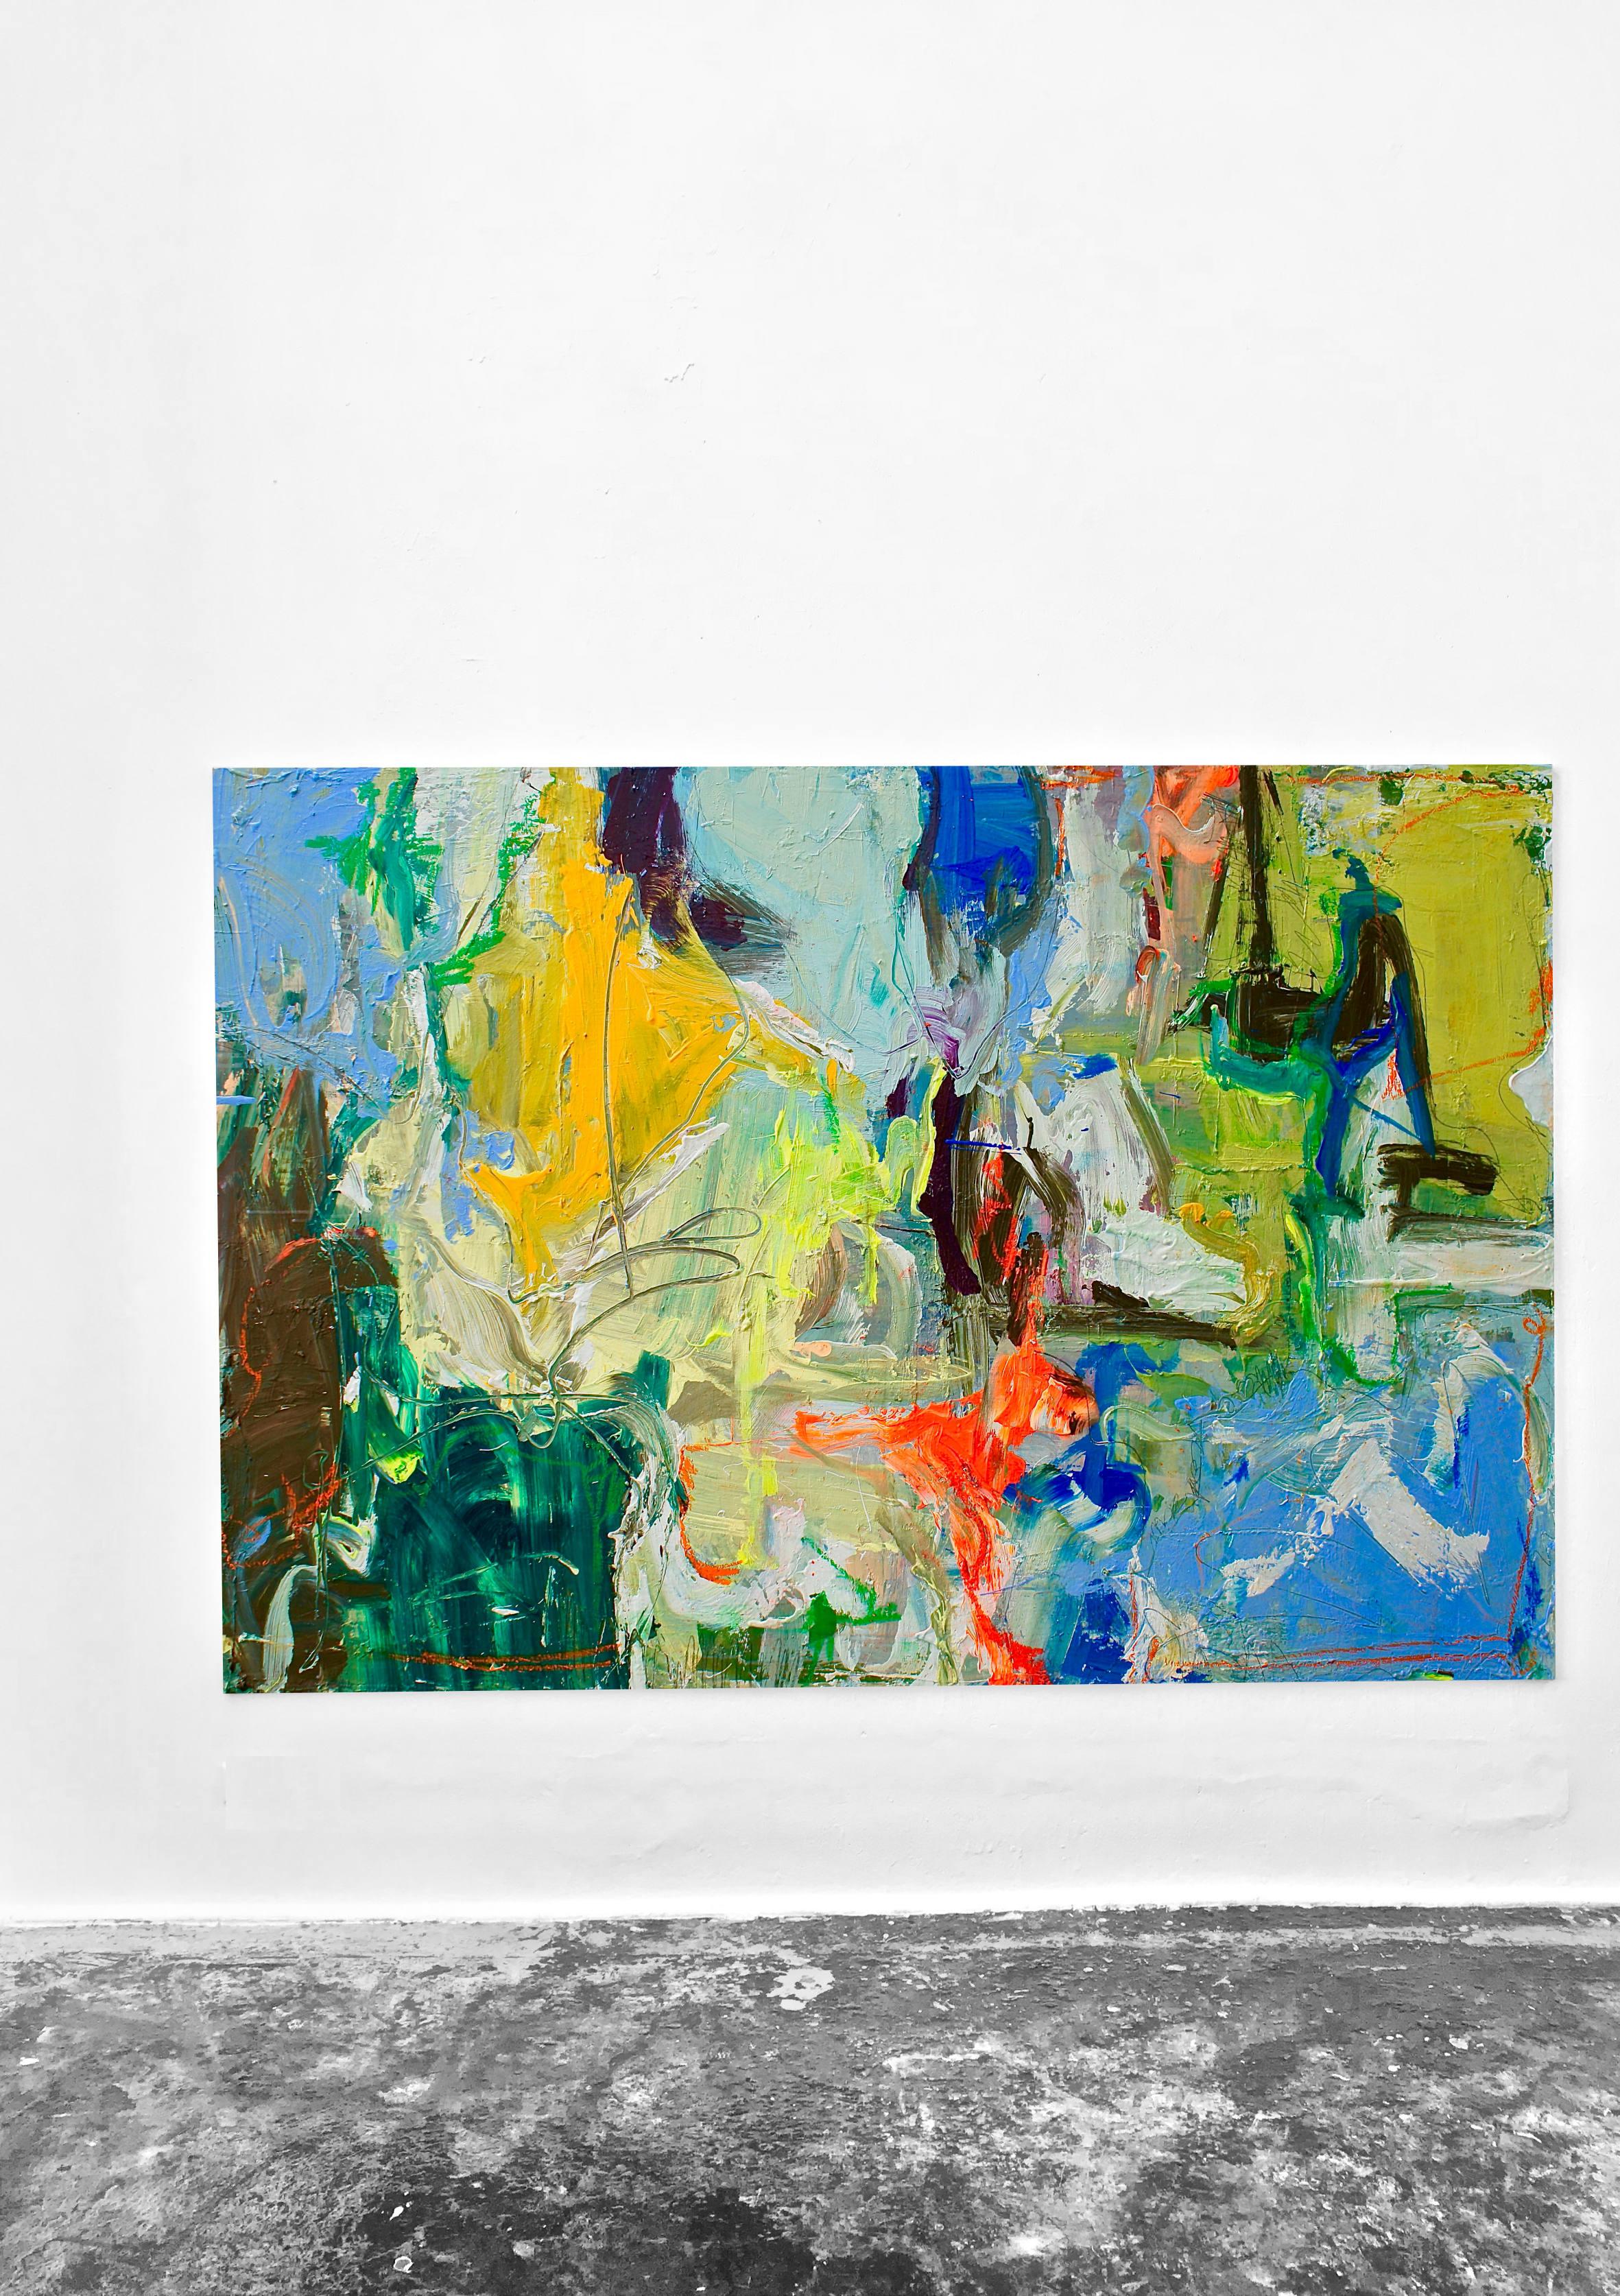 Werk_5_Kallrath_Theresa_Sleep no more_Mixed Media on Canvas_120x180_2018